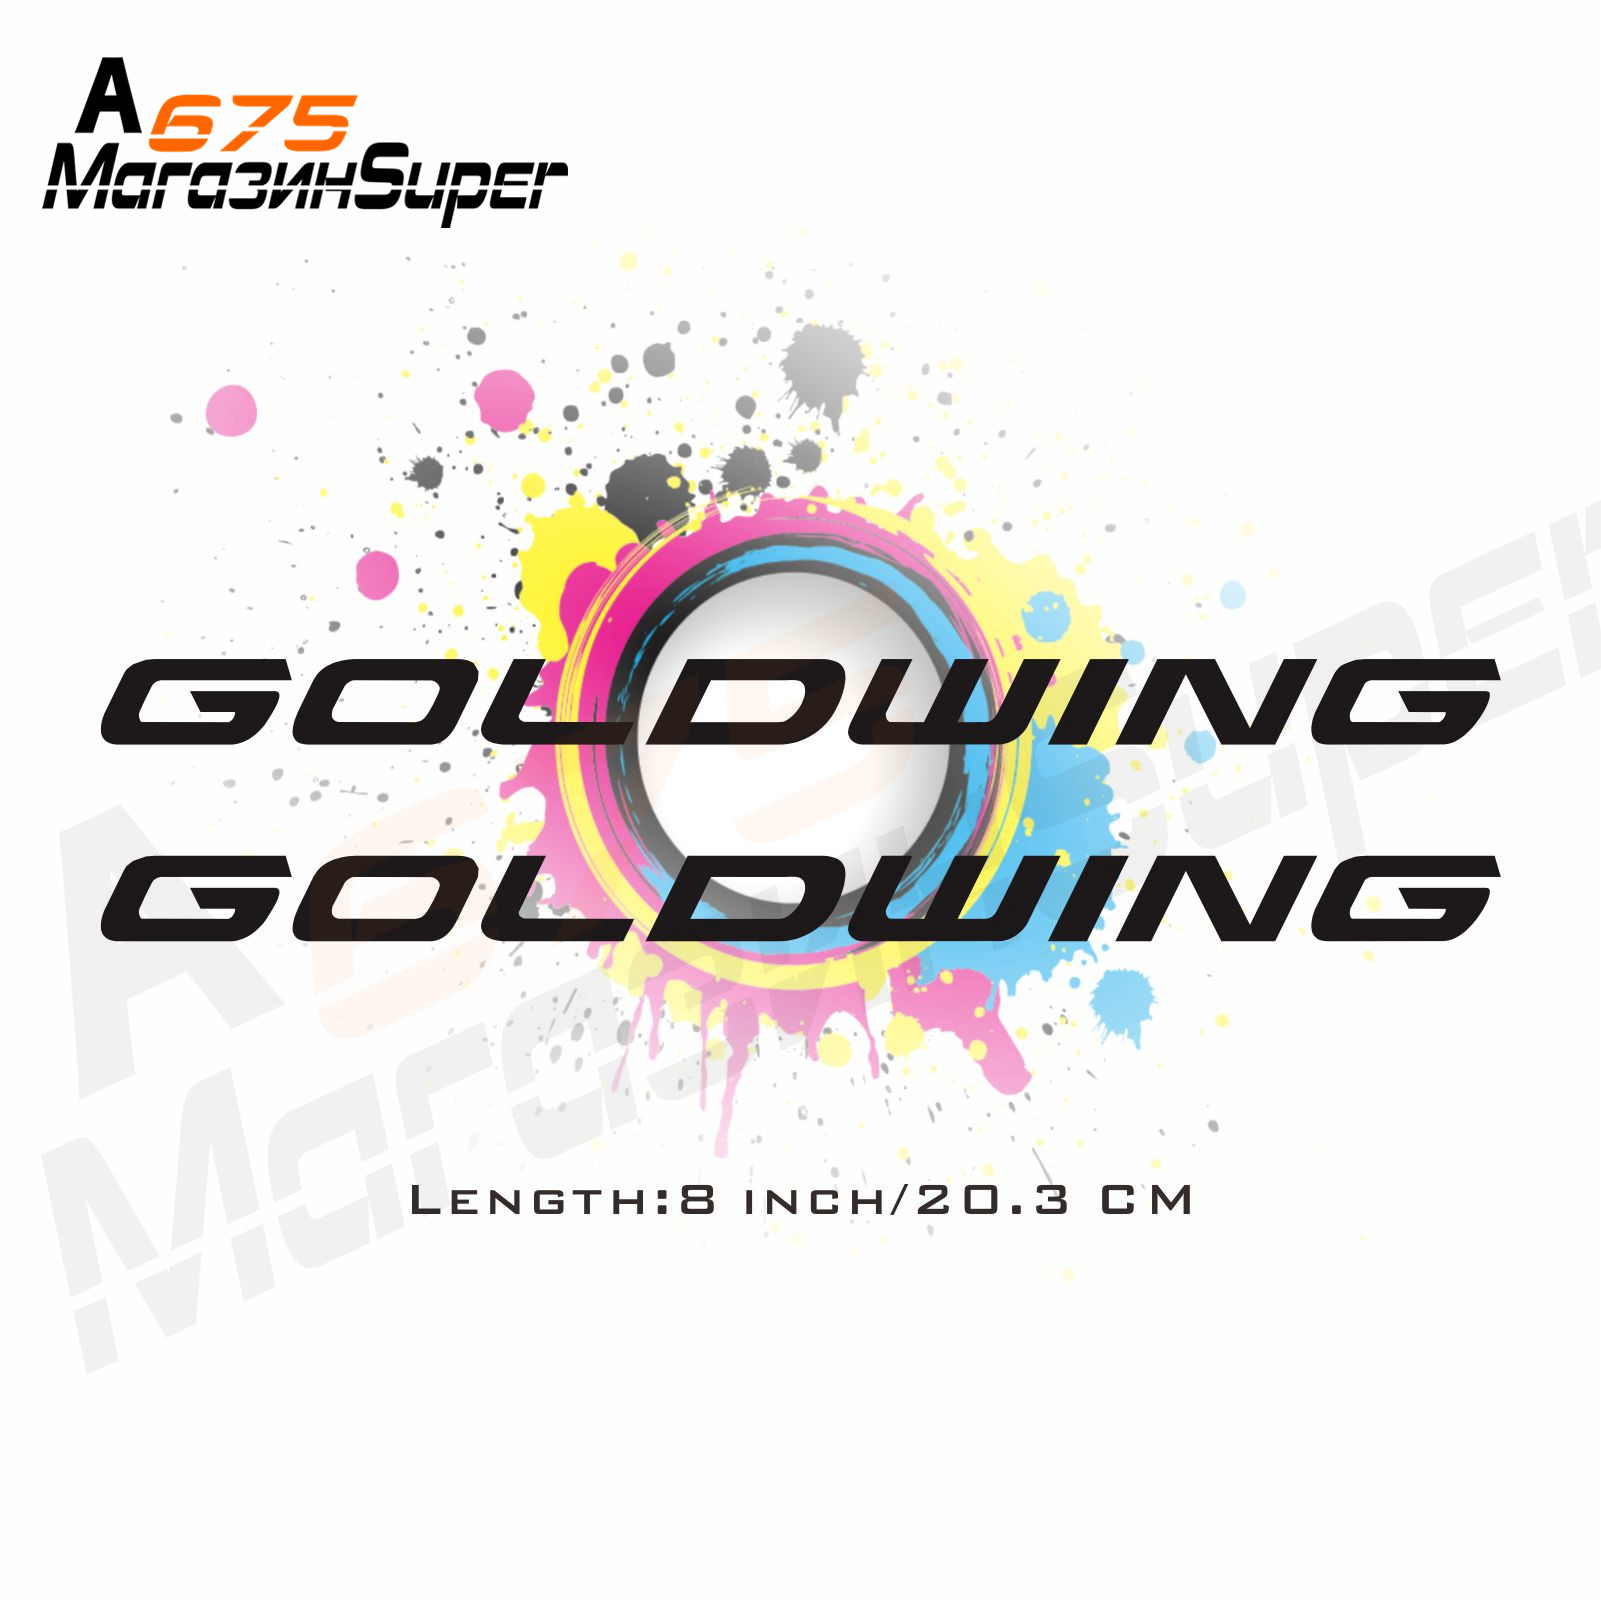 8Inch Reflective Sticker Decal Motorcycle Car Sticker Wheels Fairing Helmet Sticker Decal For HONDA Goldwing GL1800